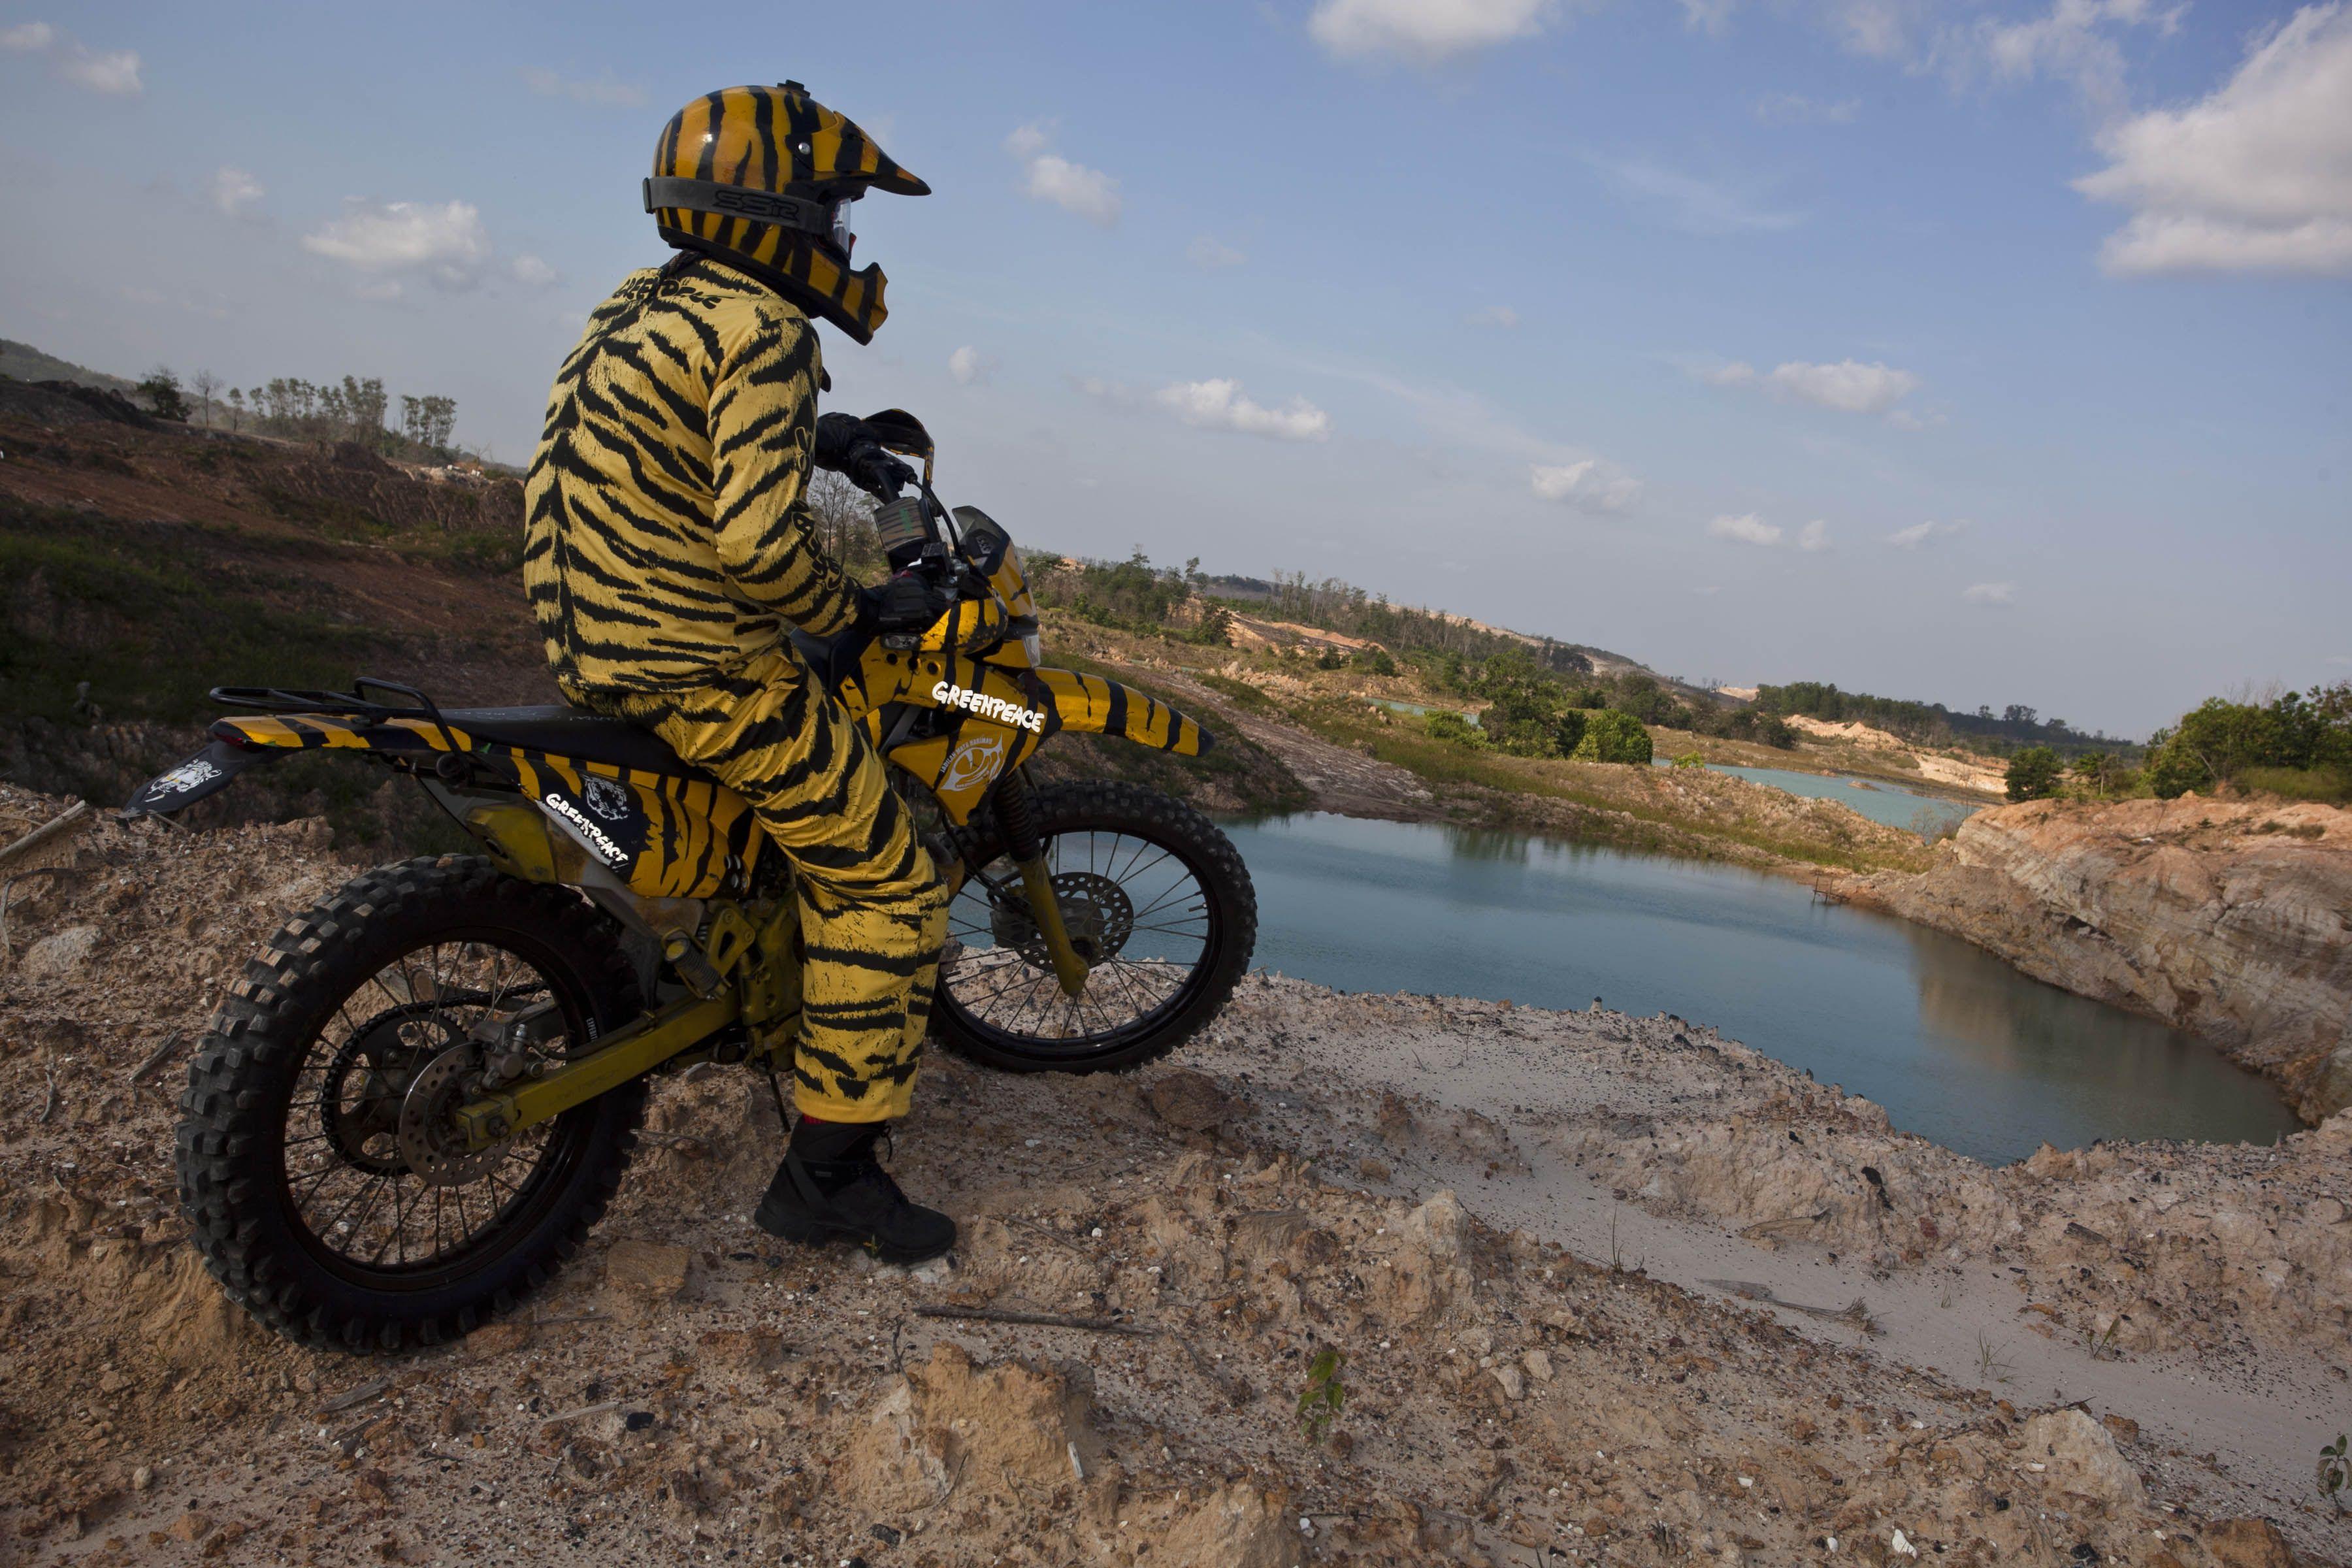 Greenpeace menelusuri areal bekas pertambangan batubara di Kalimantan Selatan yang ditinggalkan begitu saja dan menjadi danau beracun yang berbahaya bagi manusia dan lingkungan www.greenpeace.or.id/mataharimau